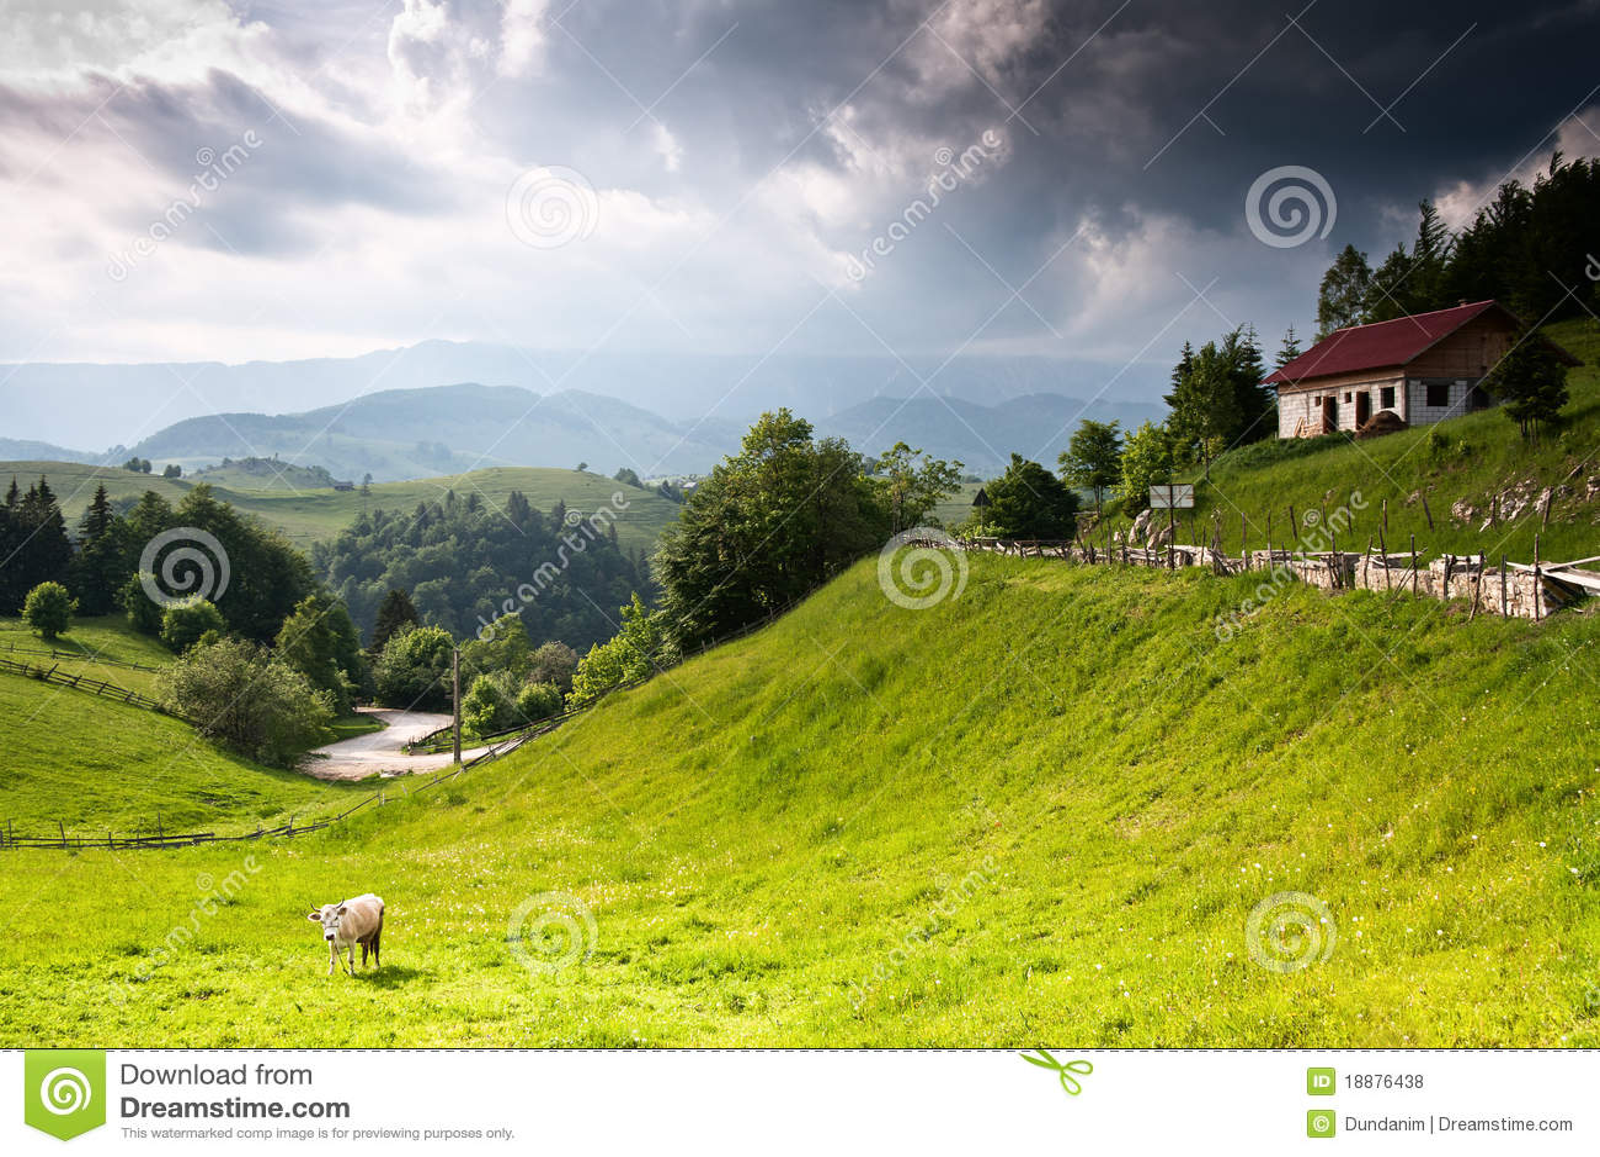 Amazing Beautiful Nature In Europe